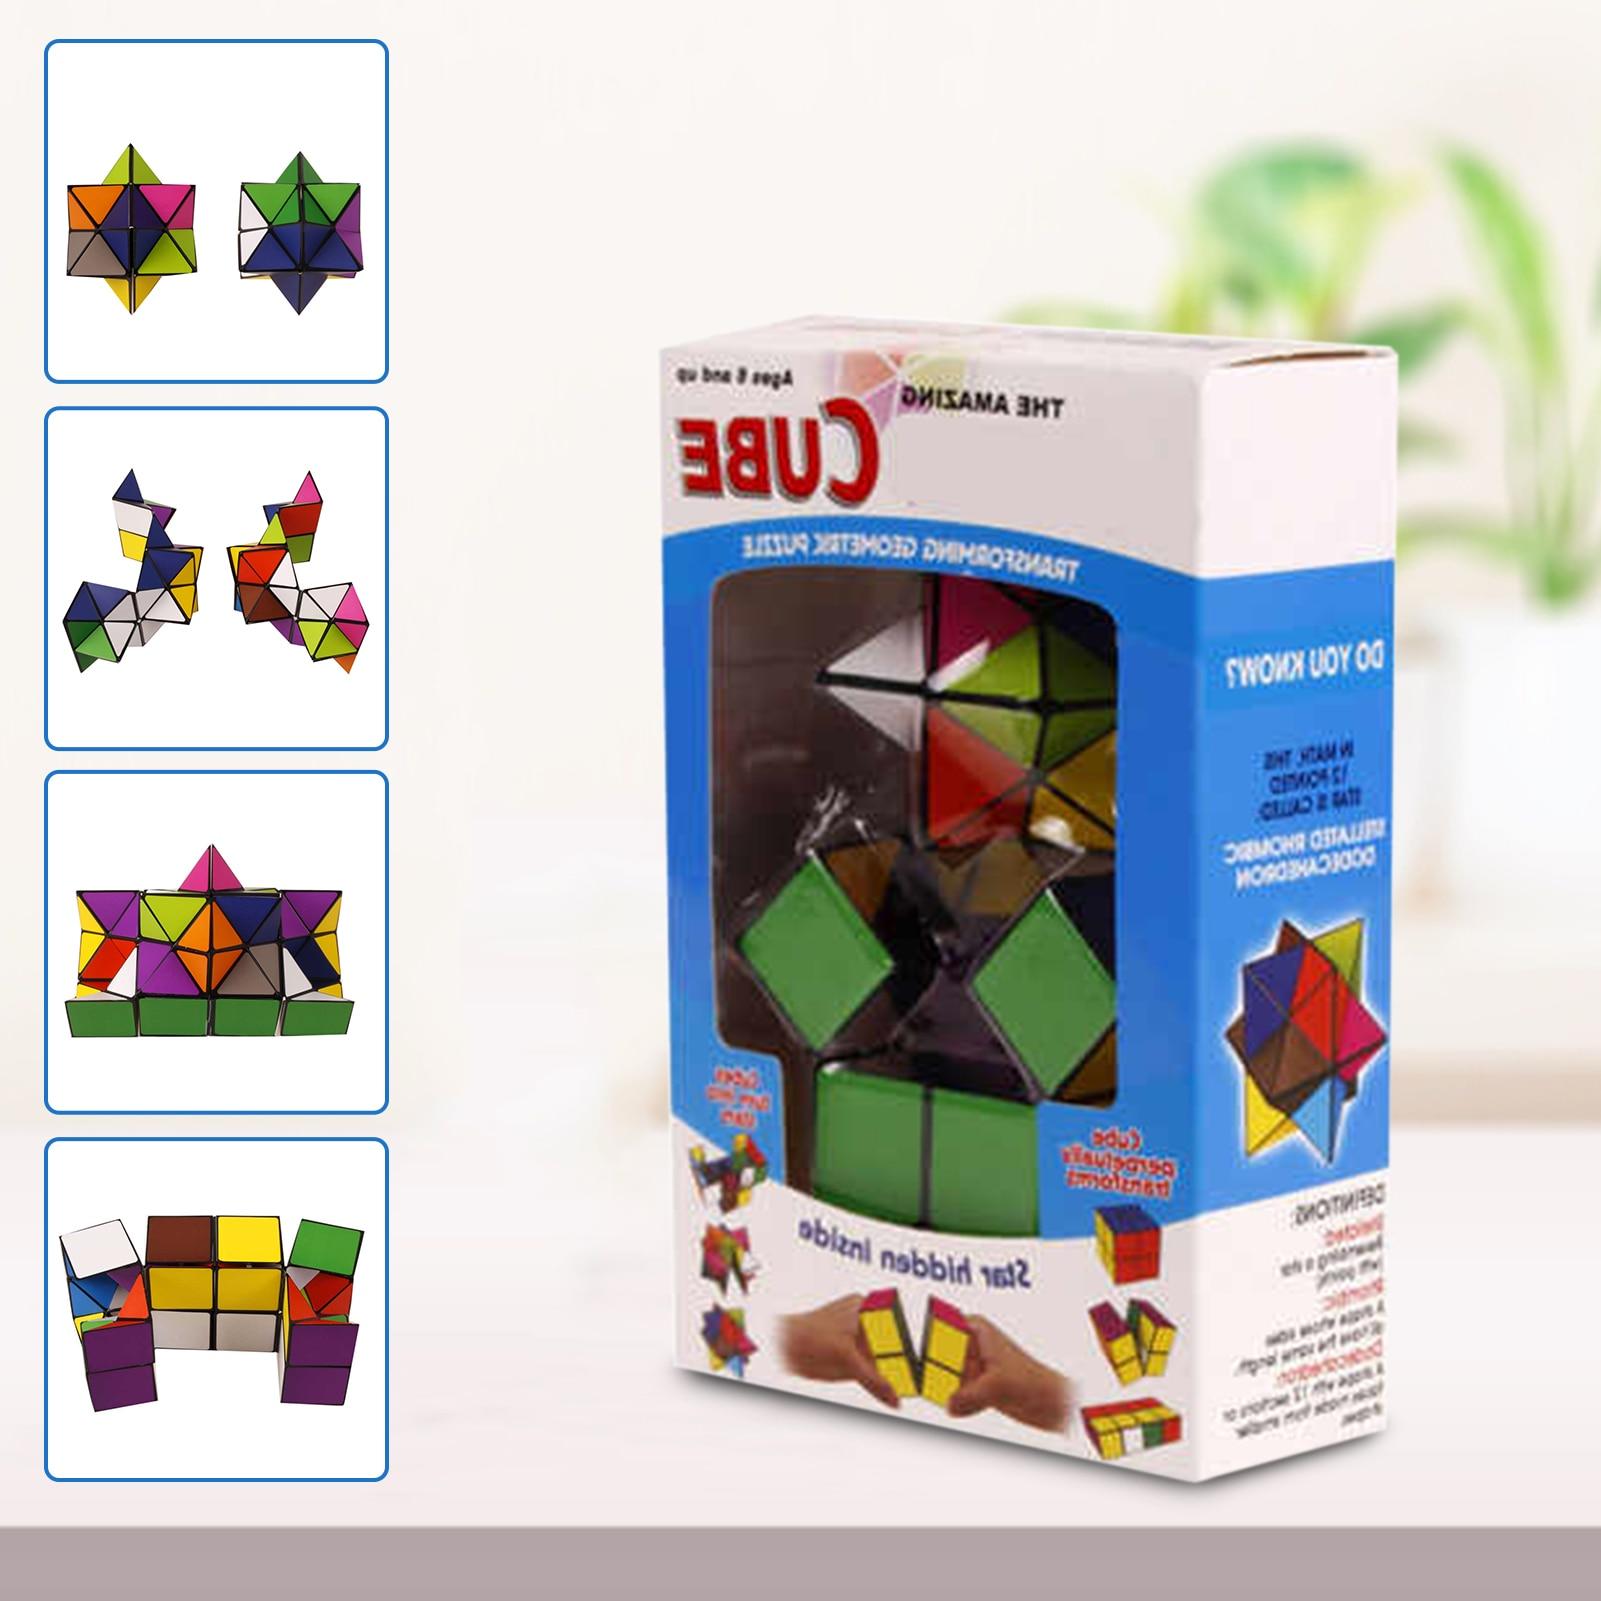 cubo magico 3d com estrela 2 em 04